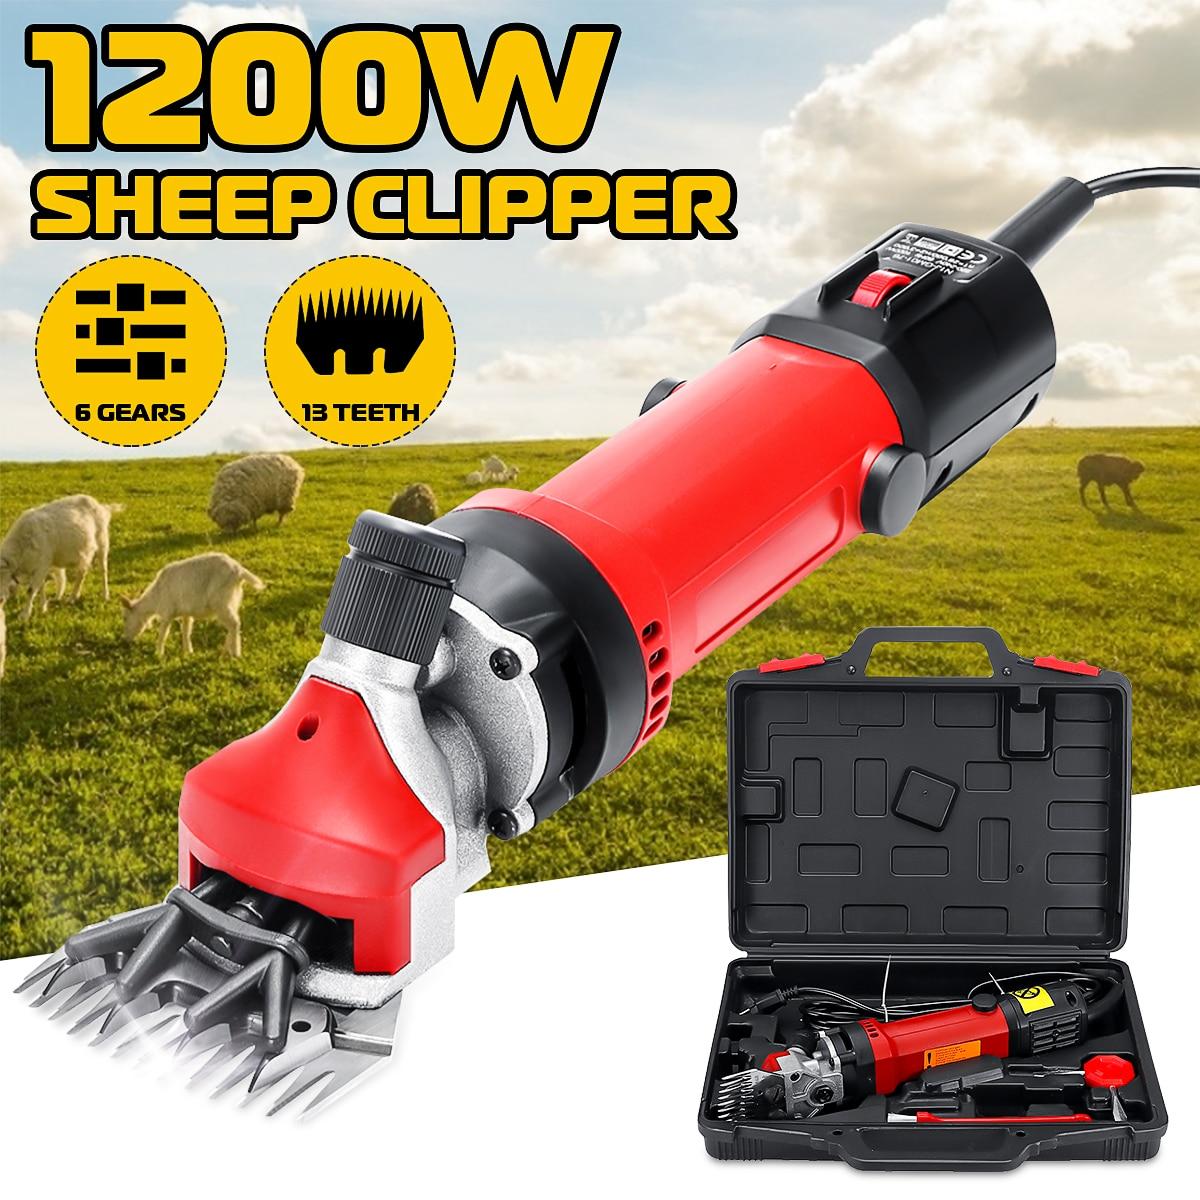 1200W US/EU Plug Electric Sheep Pet Hair Clipper Shearing Kit Shear Wool Cut Goat Pet Animal Shearing Supplies Farm Cut Machine